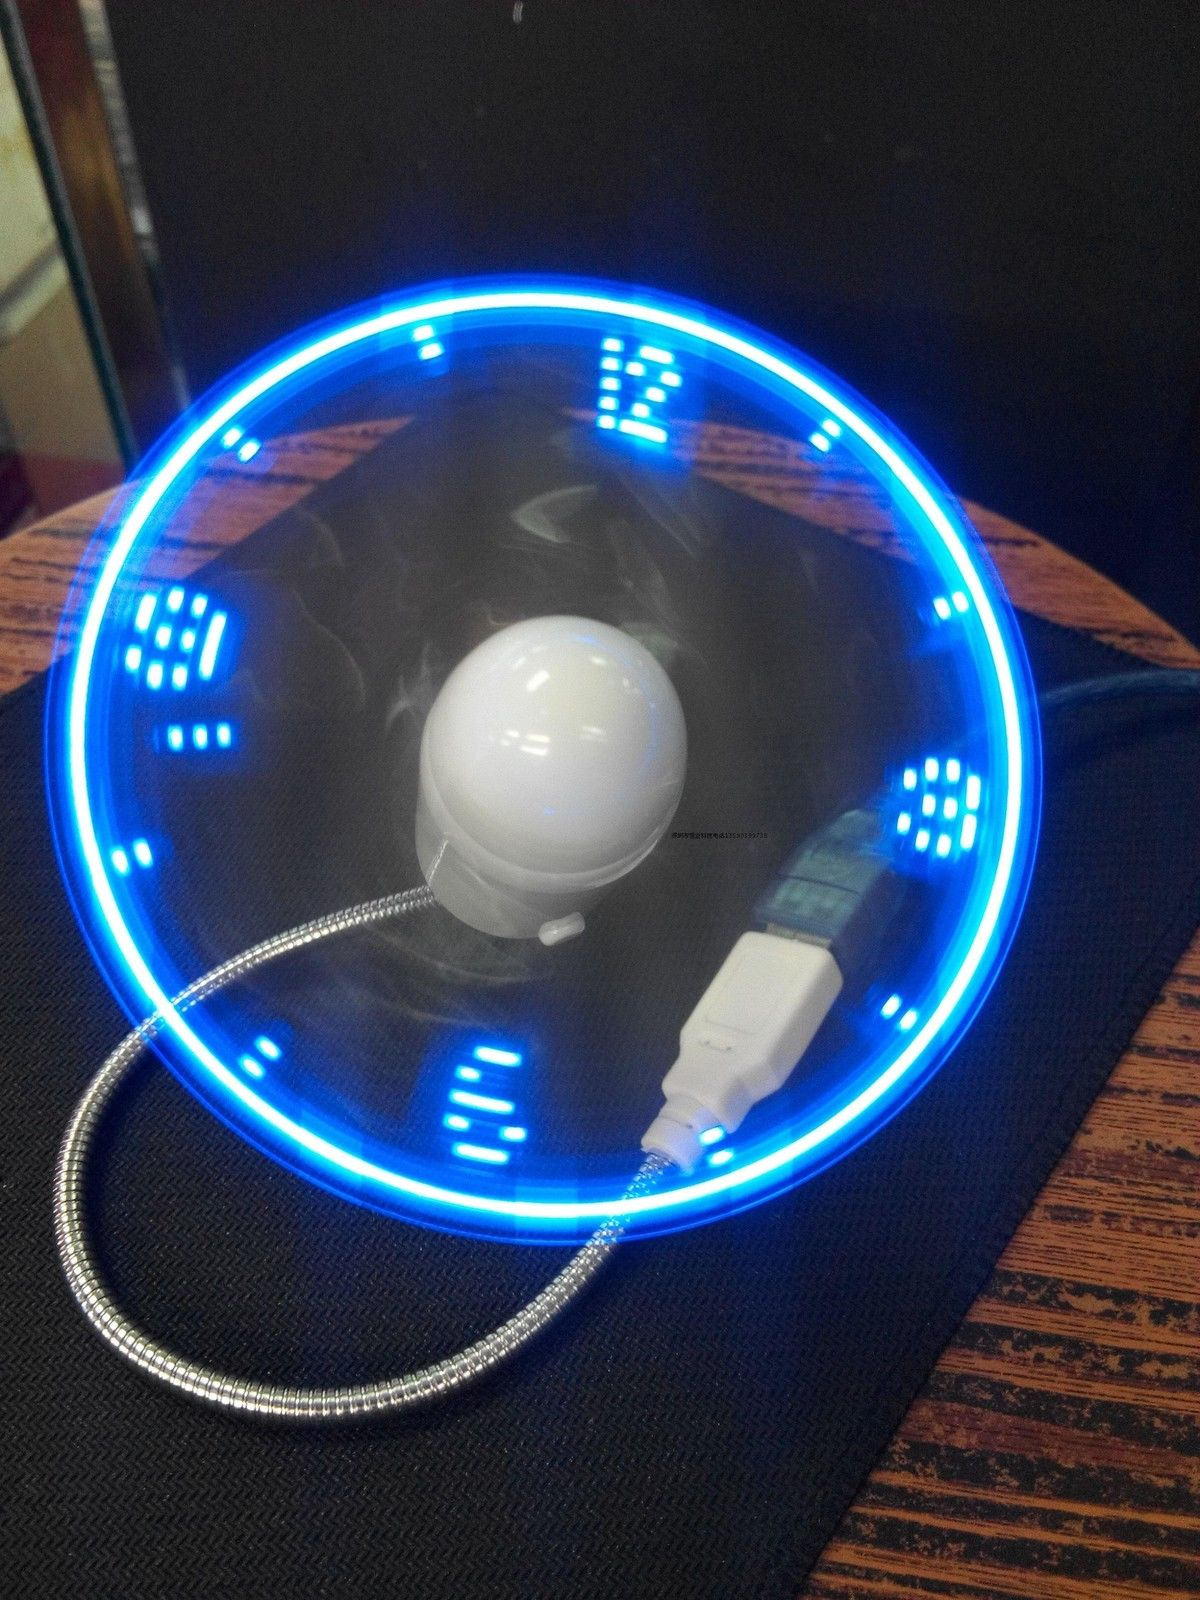 Mini lumière LED Flexible bleu réglable Gadget USB horloge de bureau horloge de bureau